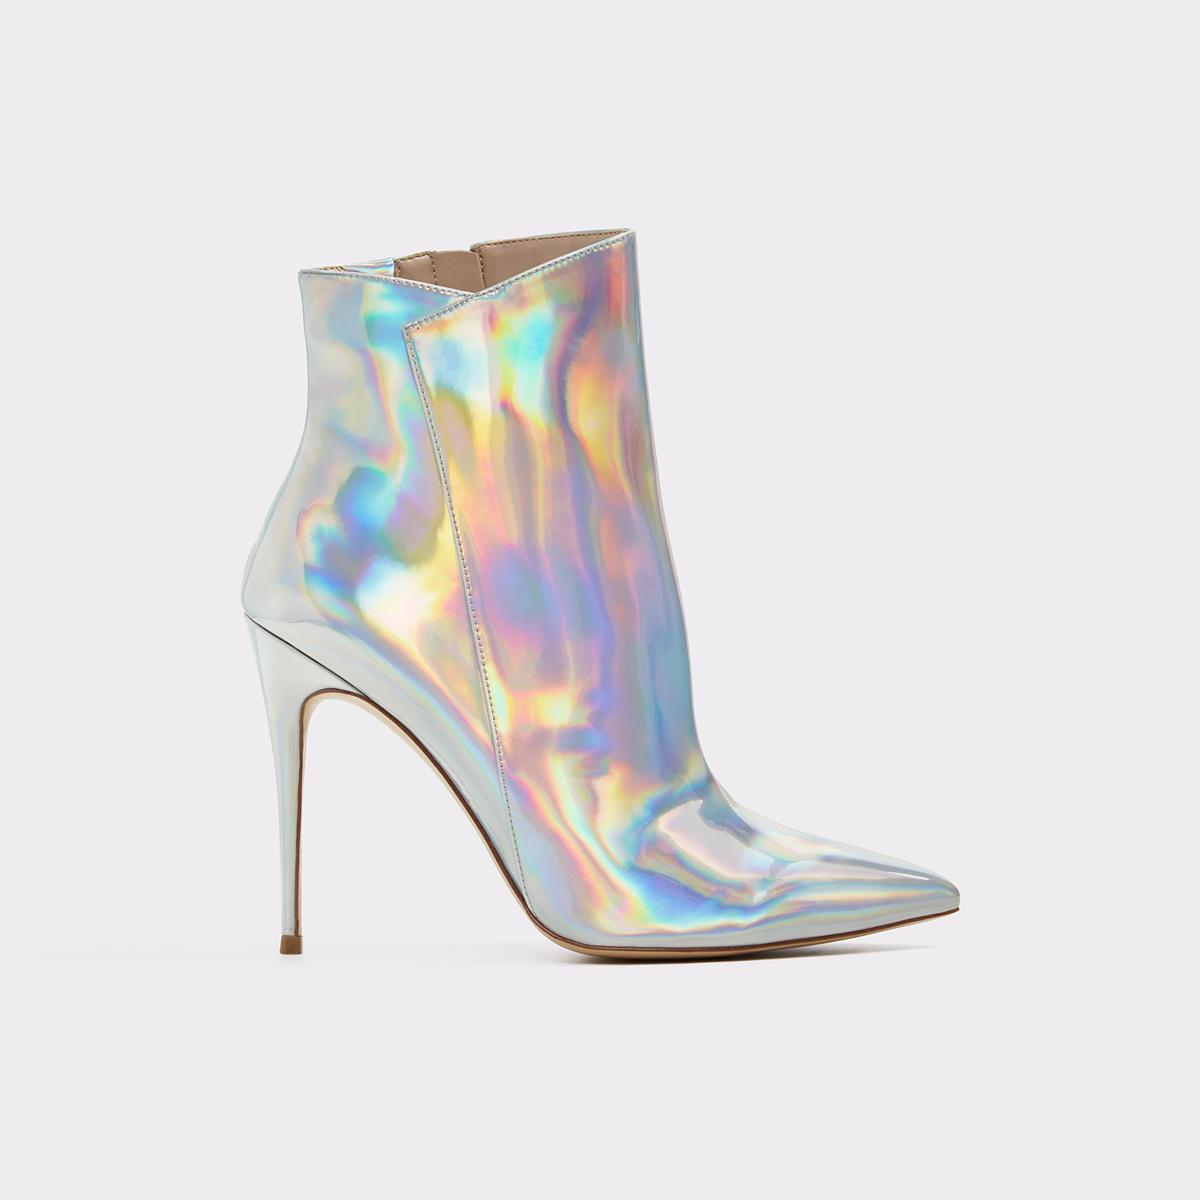 3c5e82f2b4de Merealonna Silver Women s Boots